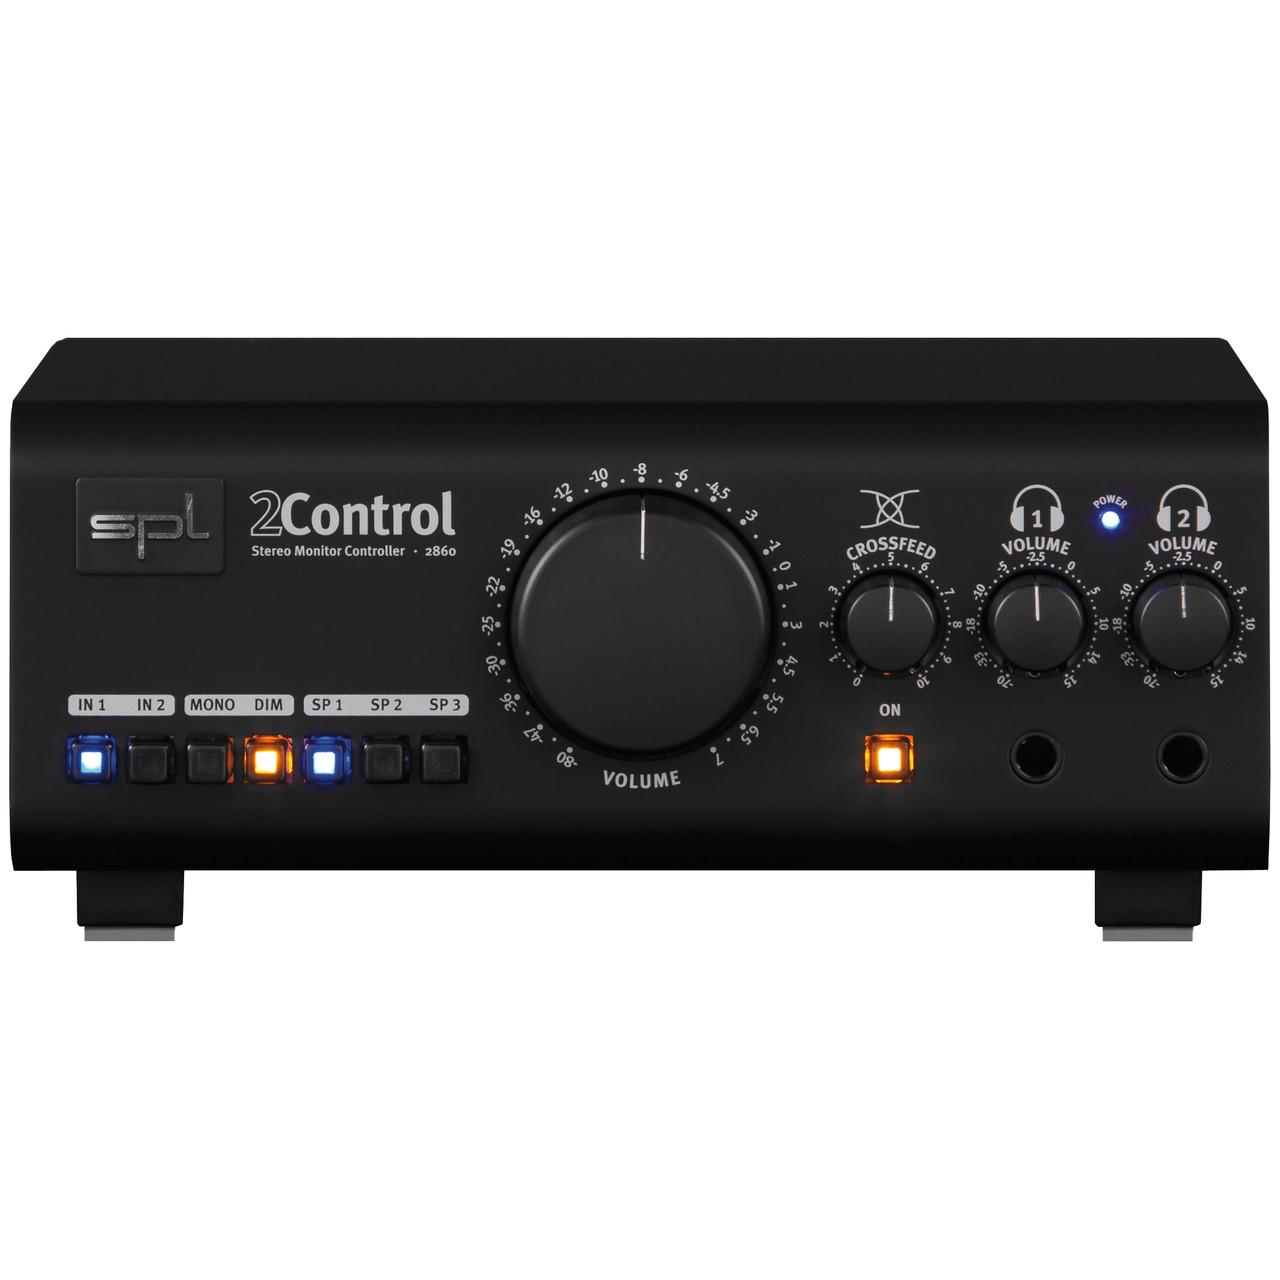 2Control (Black)